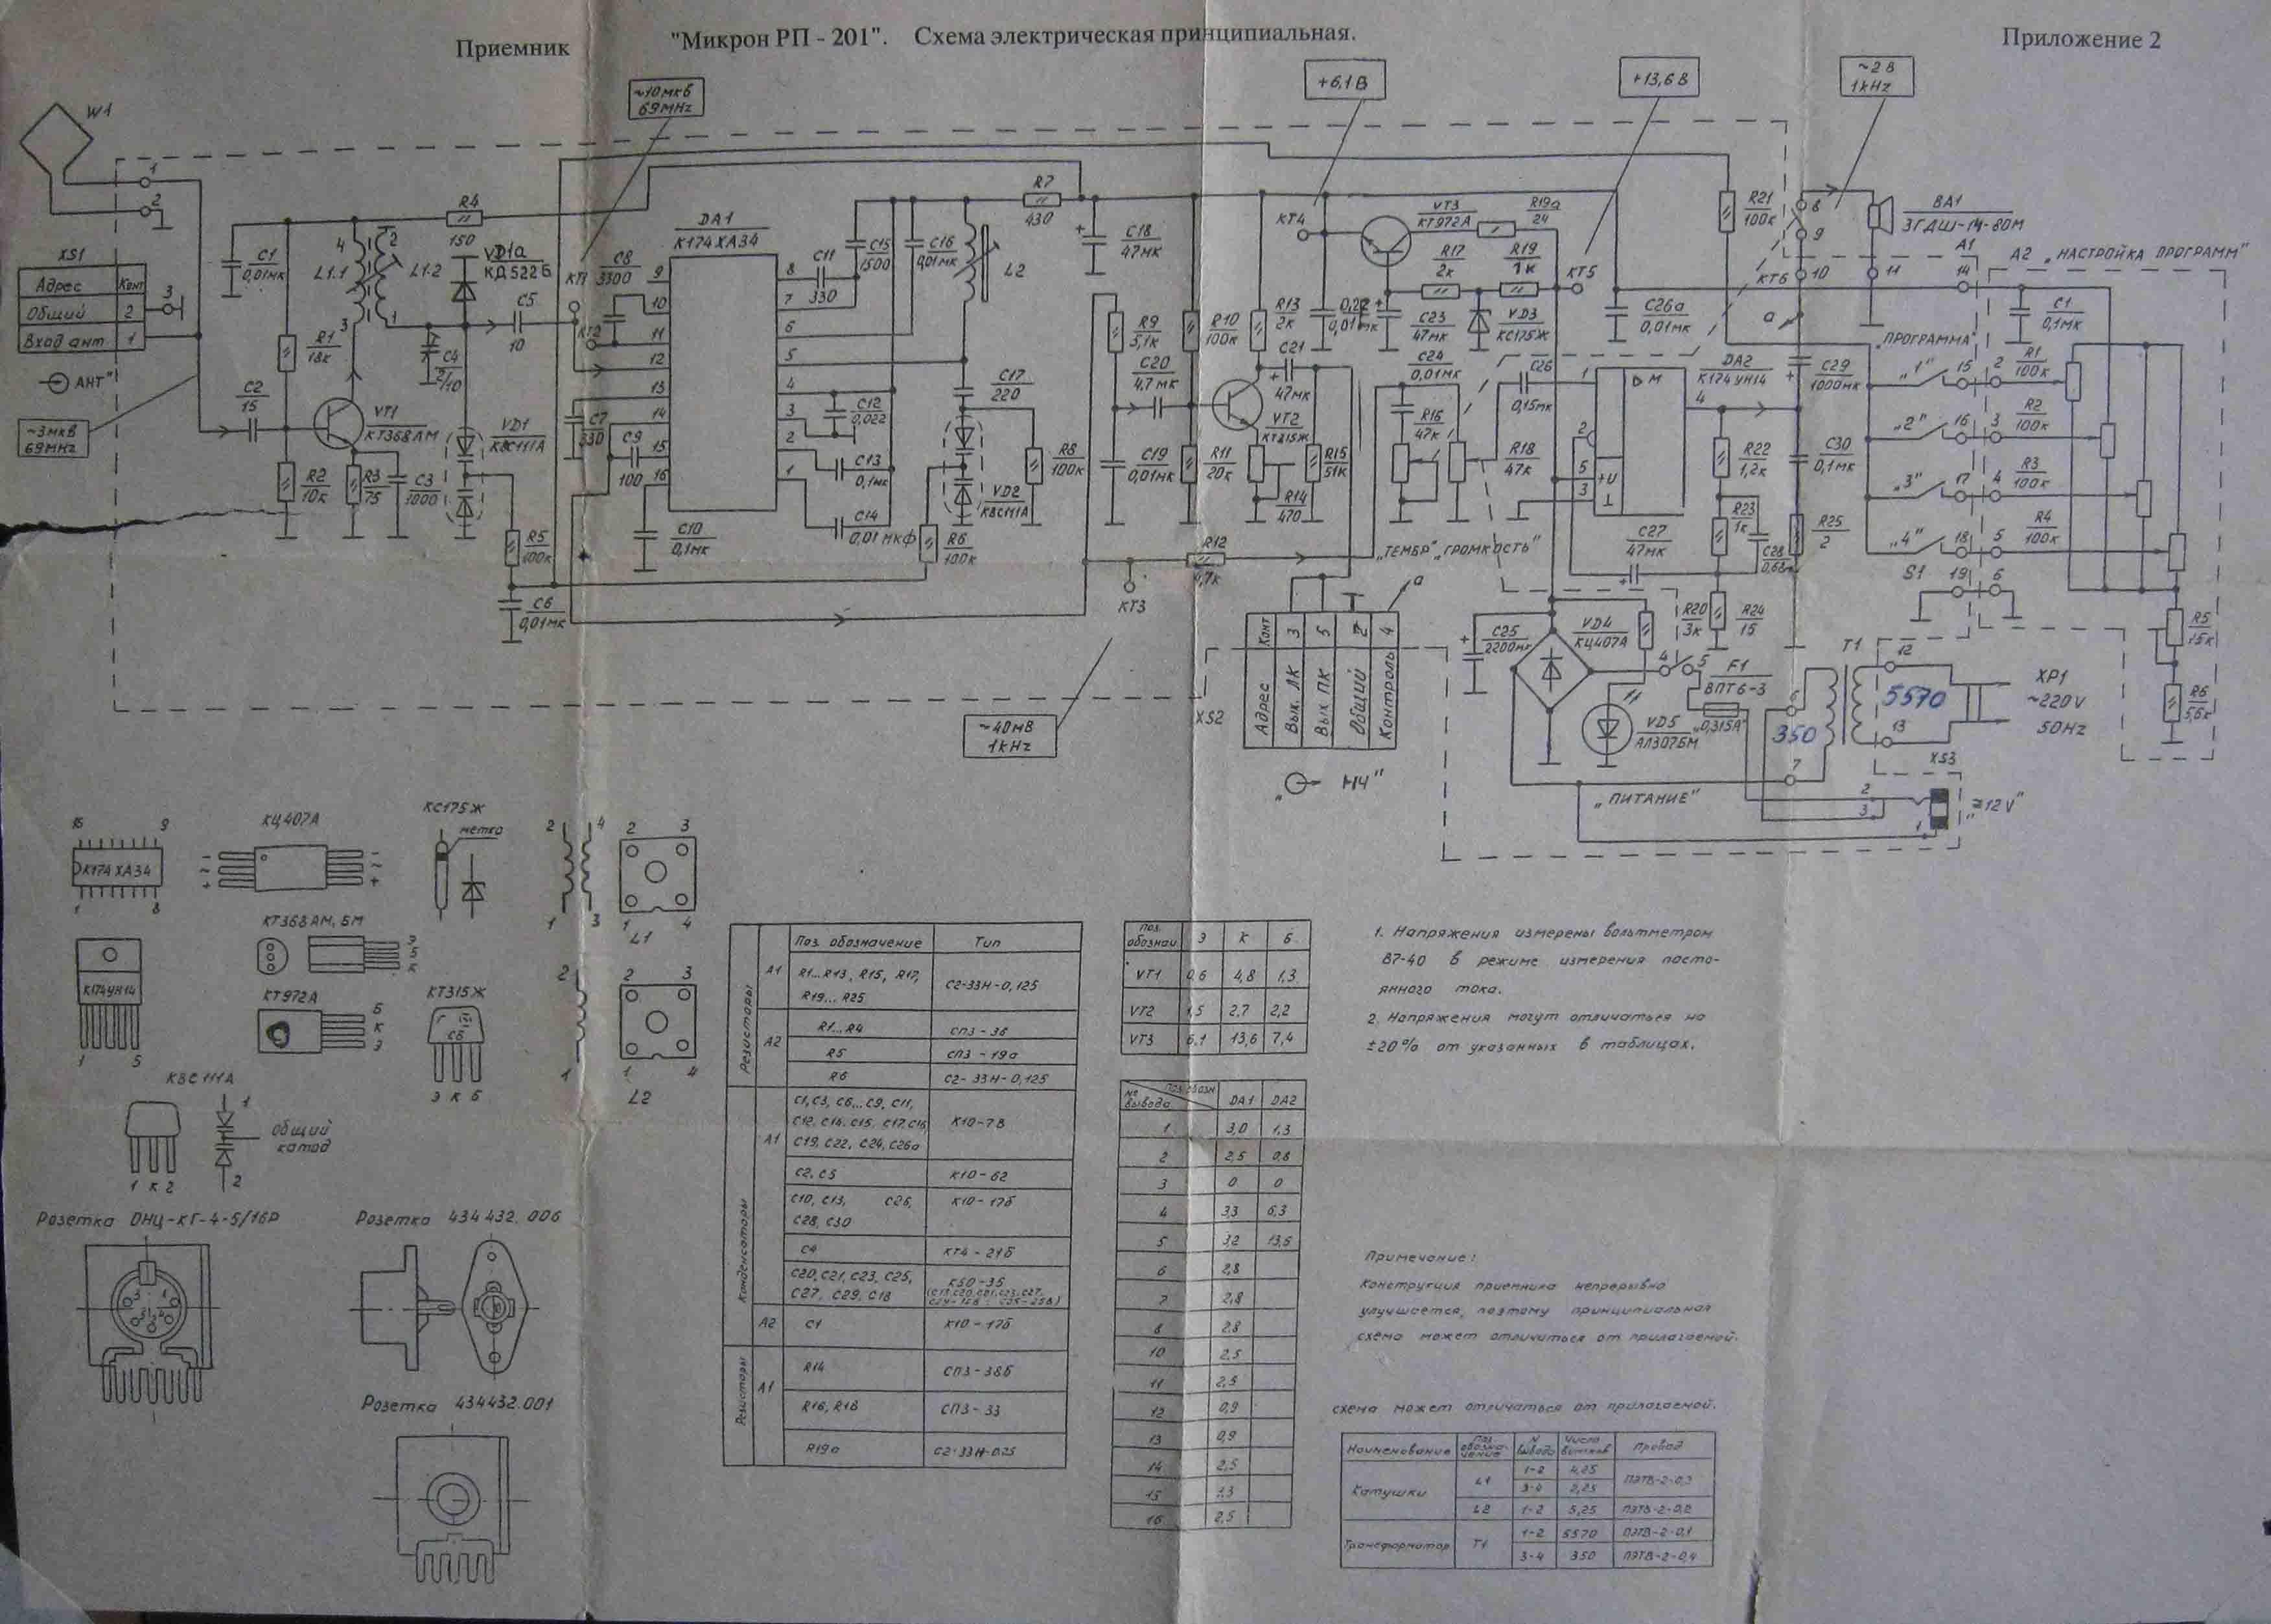 схема радиоприемника кварц 401